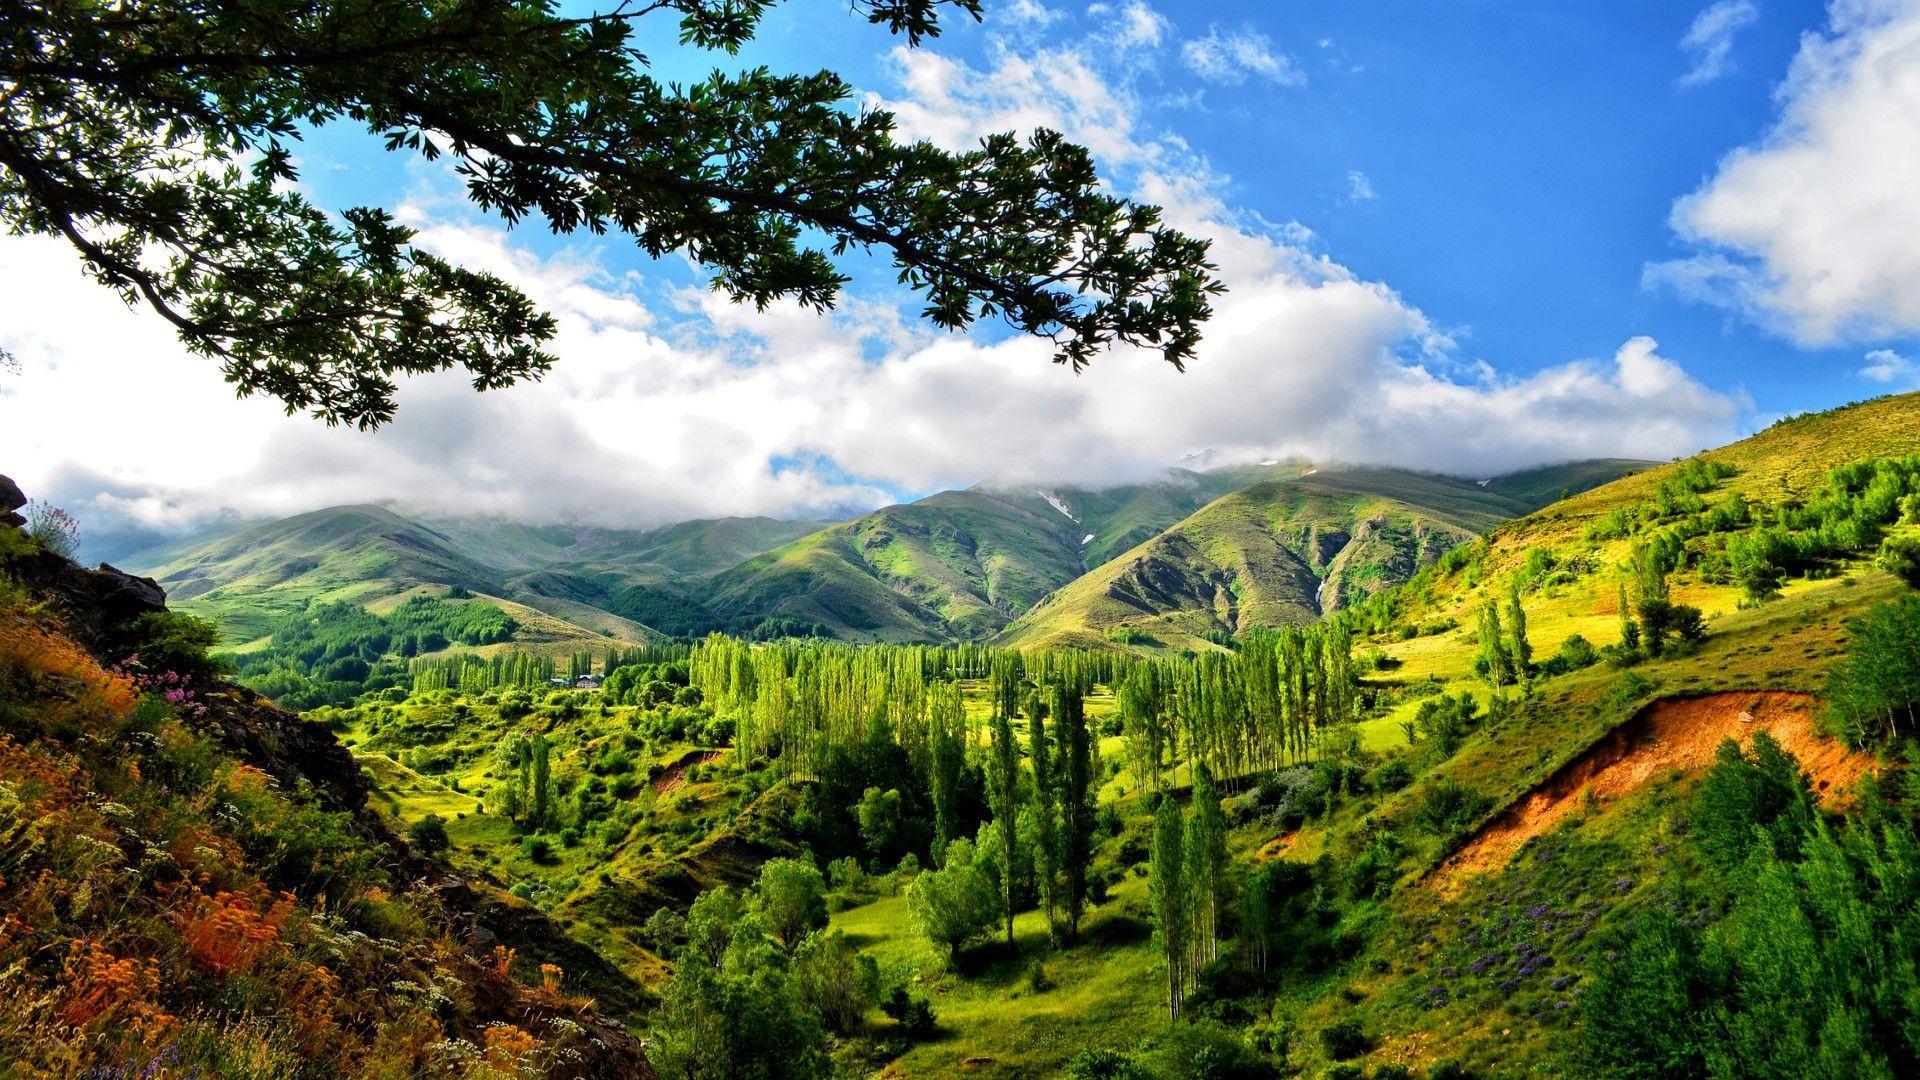 4k nature landscape mountain wallpapers mountains wallpaperaccess backgrounds videolan addons opendesktop score